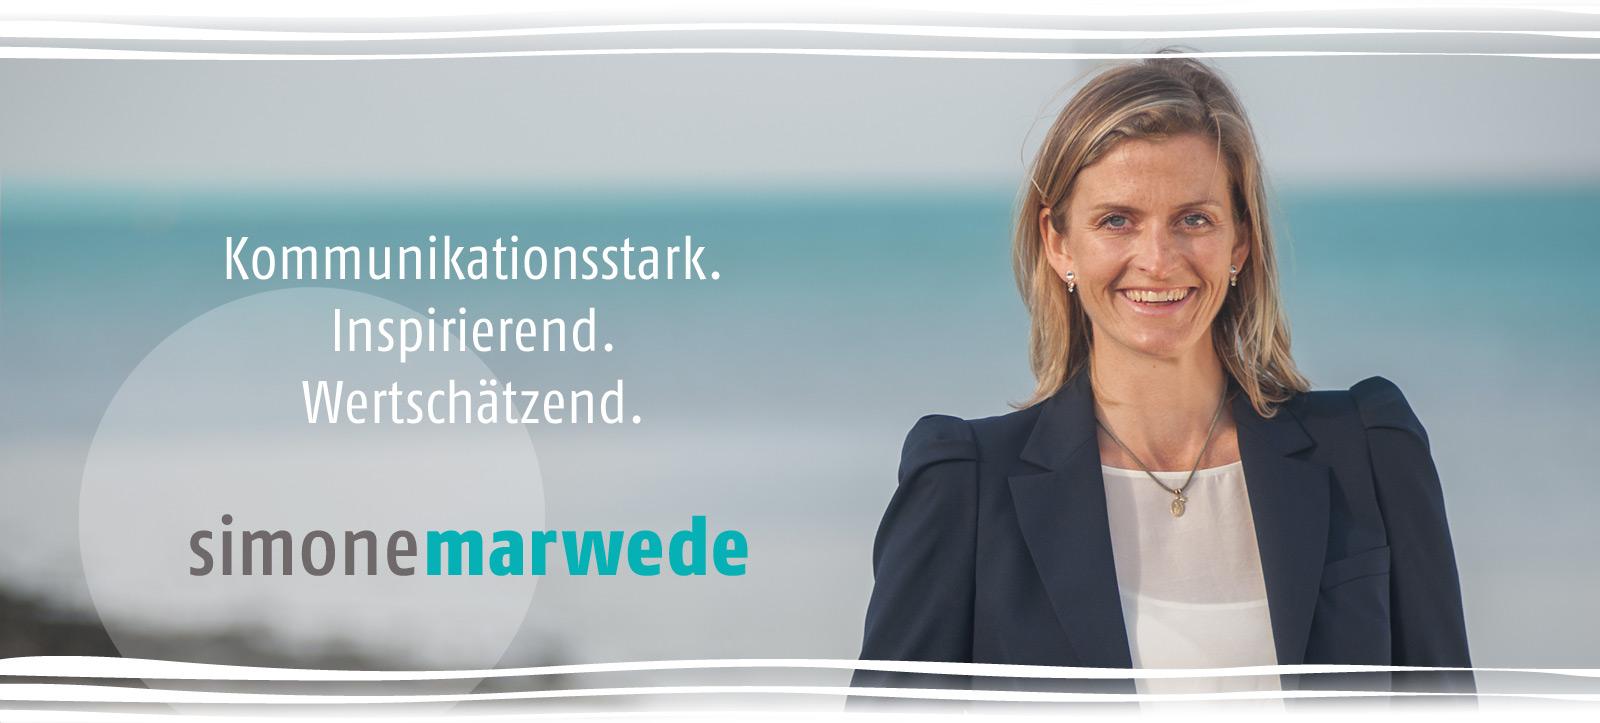 images-simone-marwede-psychologin-moderatorin2-sylt